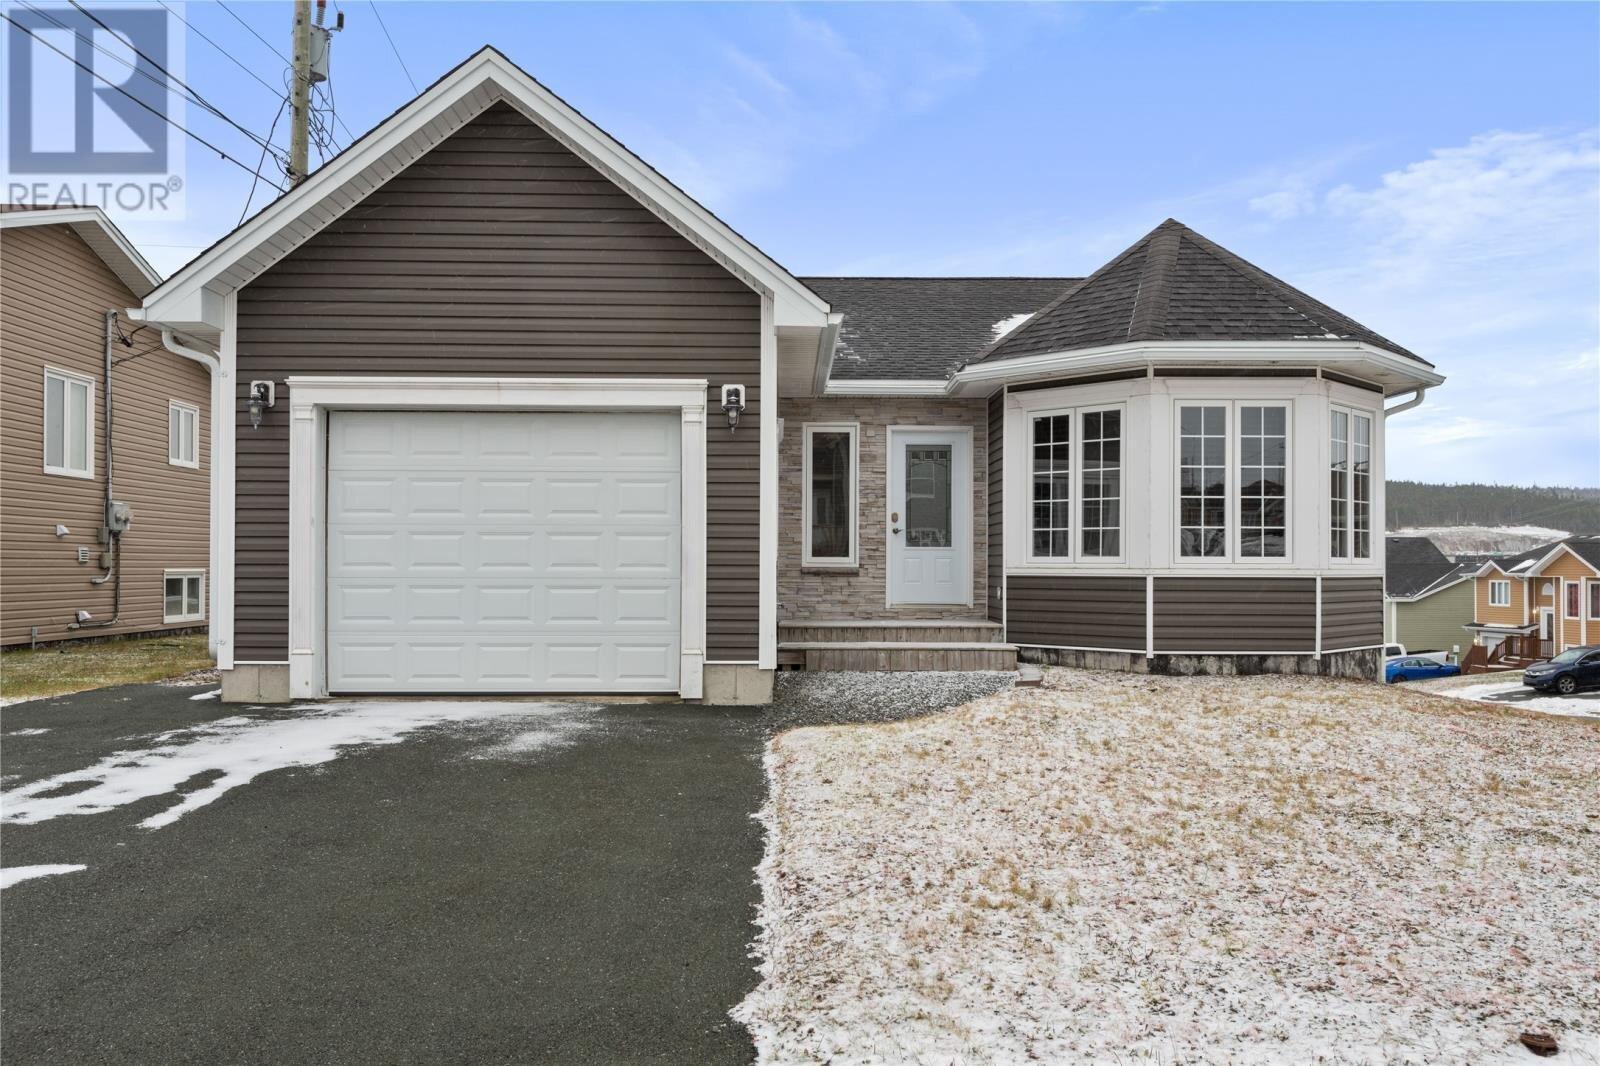 House for sale at 2 Marsland Pl St. John's Newfoundland - MLS: 1223545